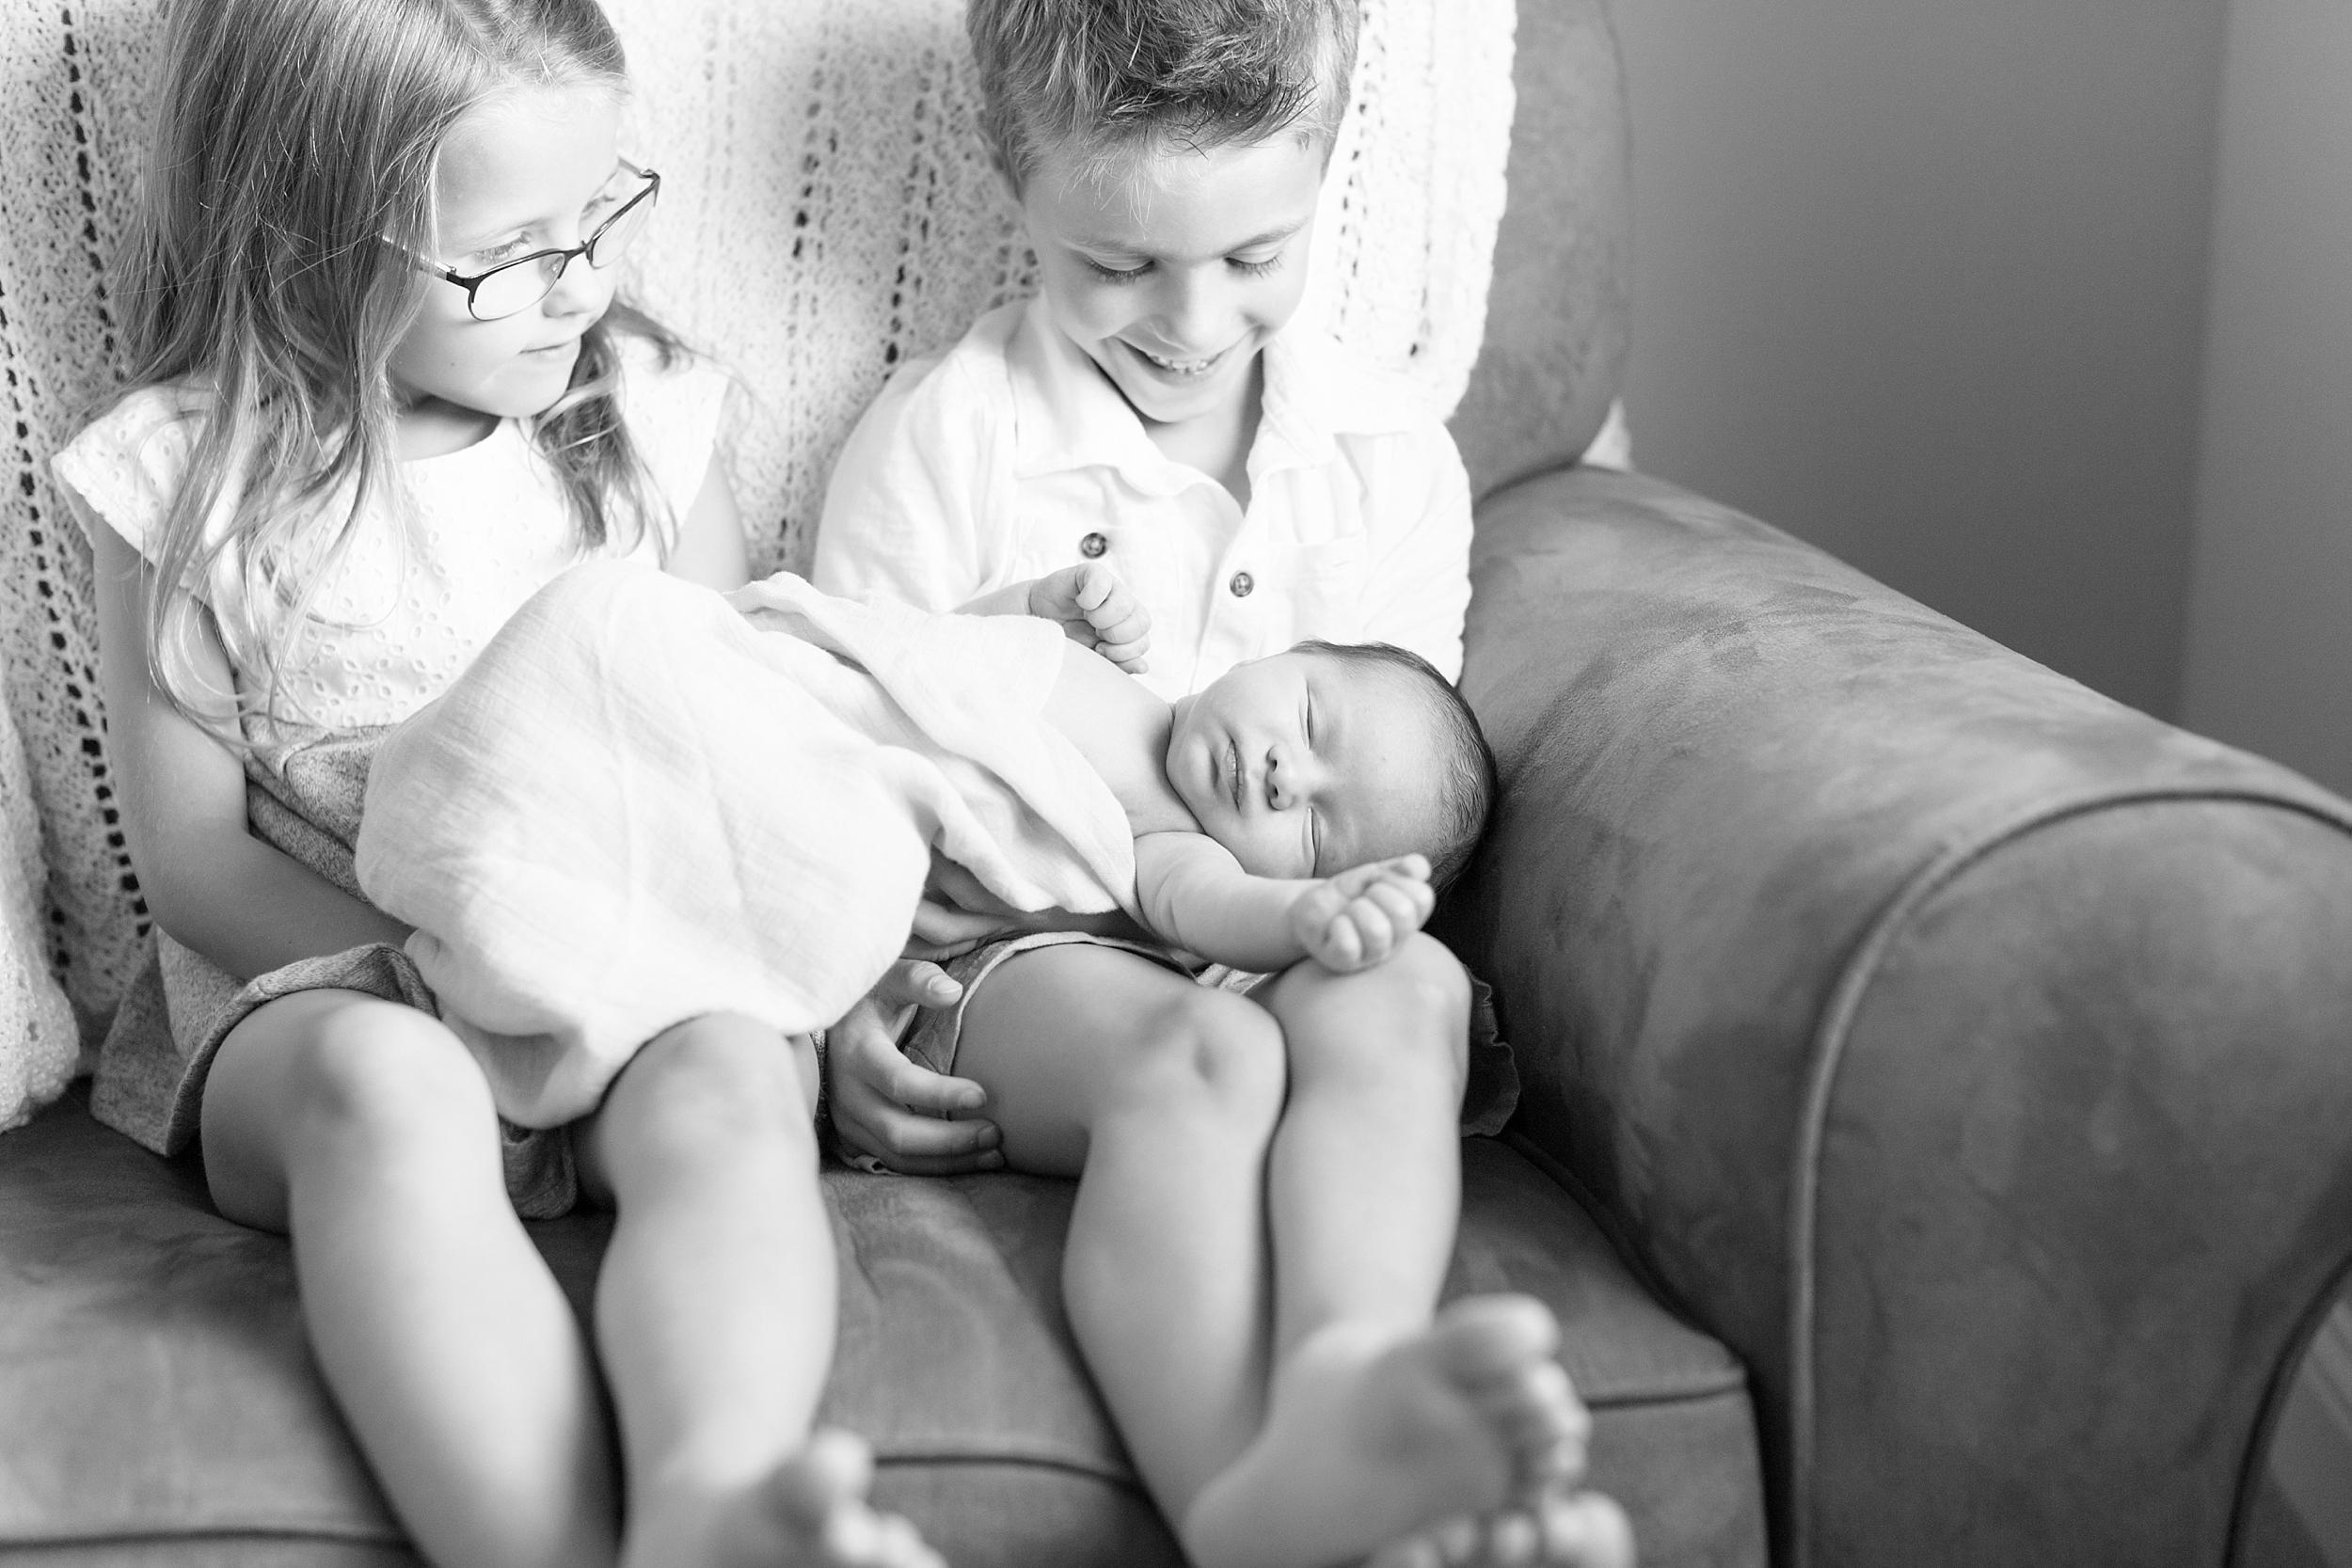 Landon-Schneider-Photography-Newborn-Session-Texas_0099.jpg